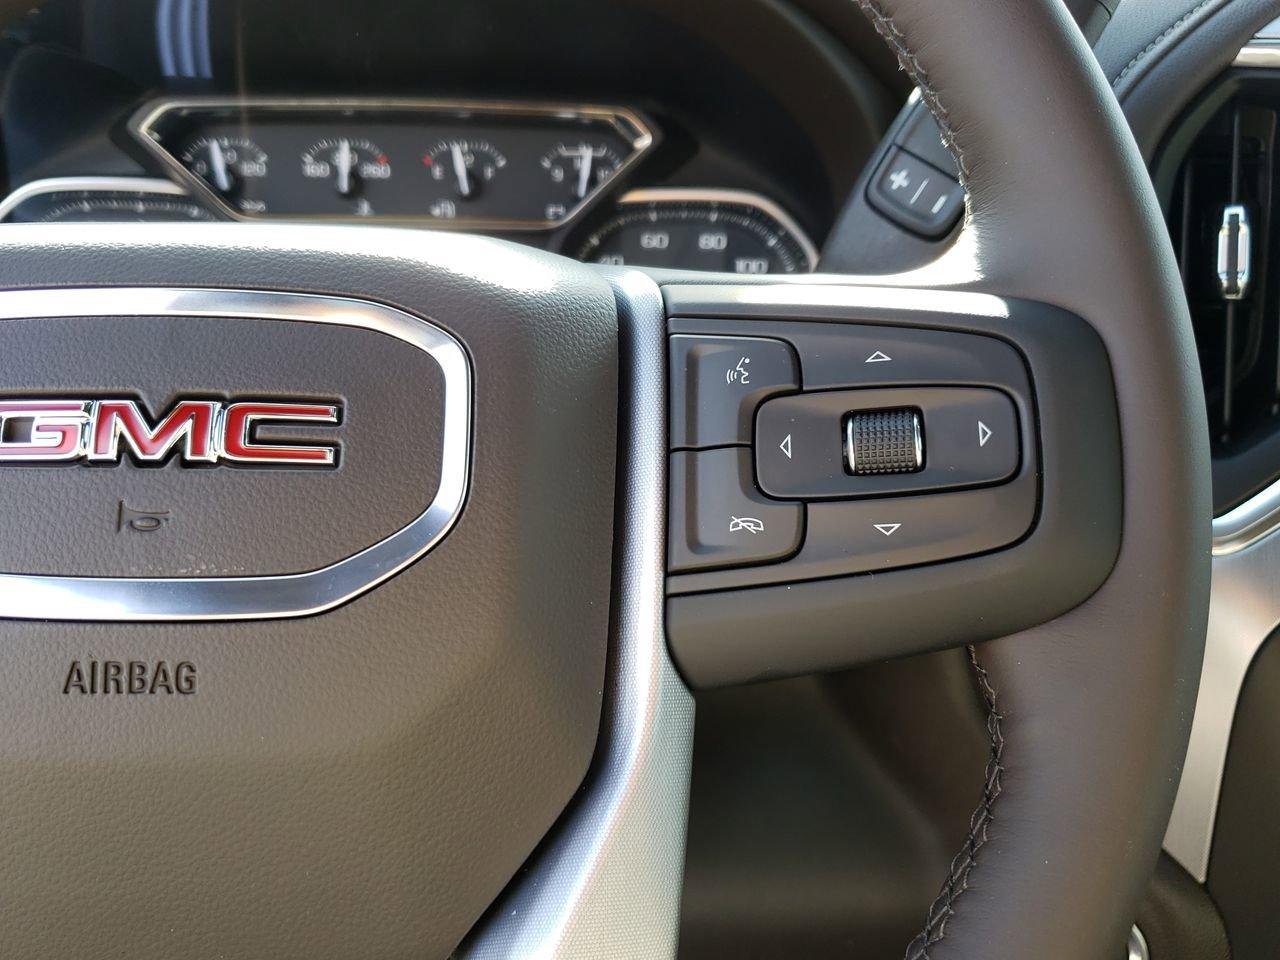 New 2020 GMC Sierra 1500 SLT